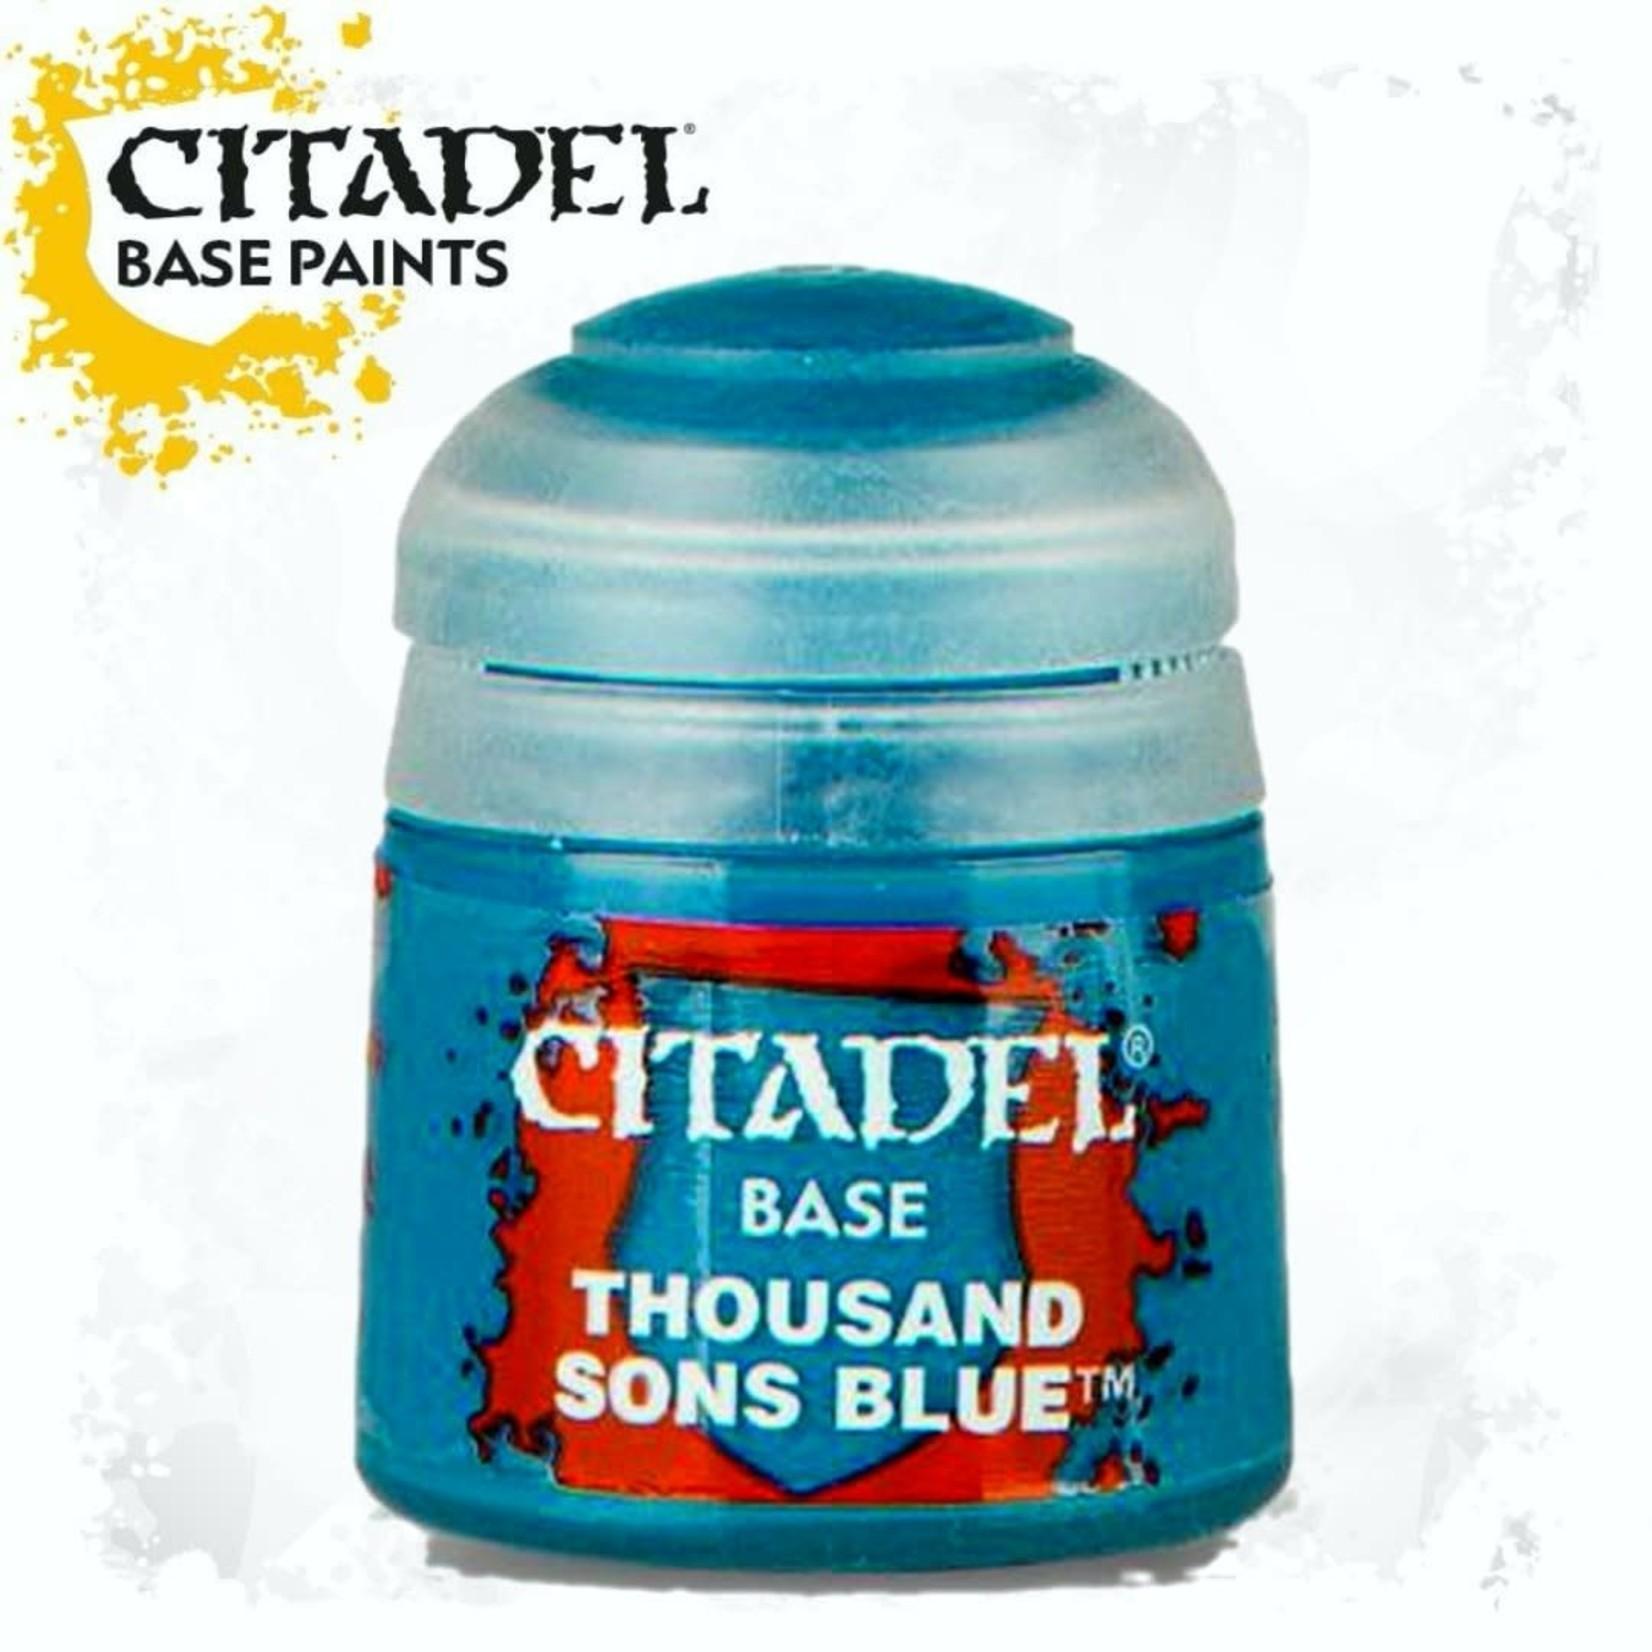 Citadel Citadel Paint - Base: Thousand Sons Blue